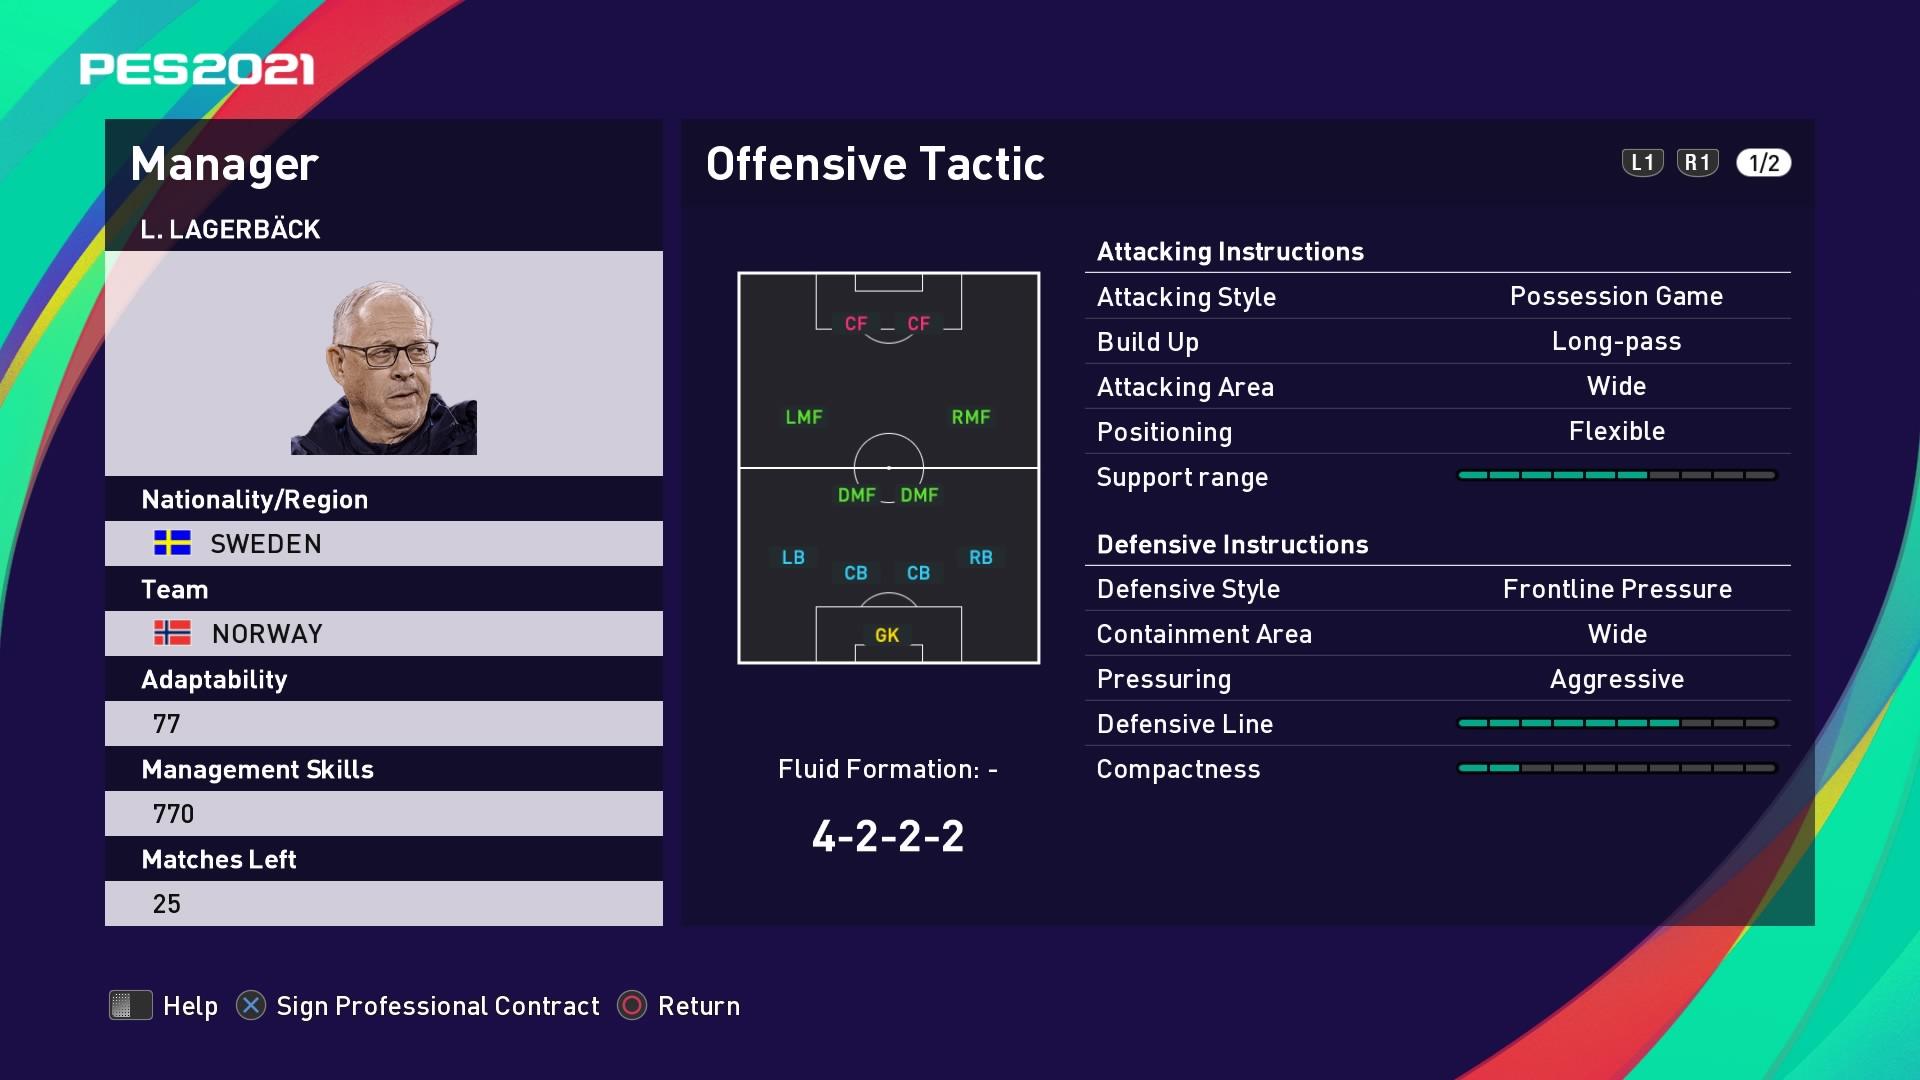 L. Lagerbäck (Lars Lagerbäck) Offensive Tactic in PES 2021 myClub